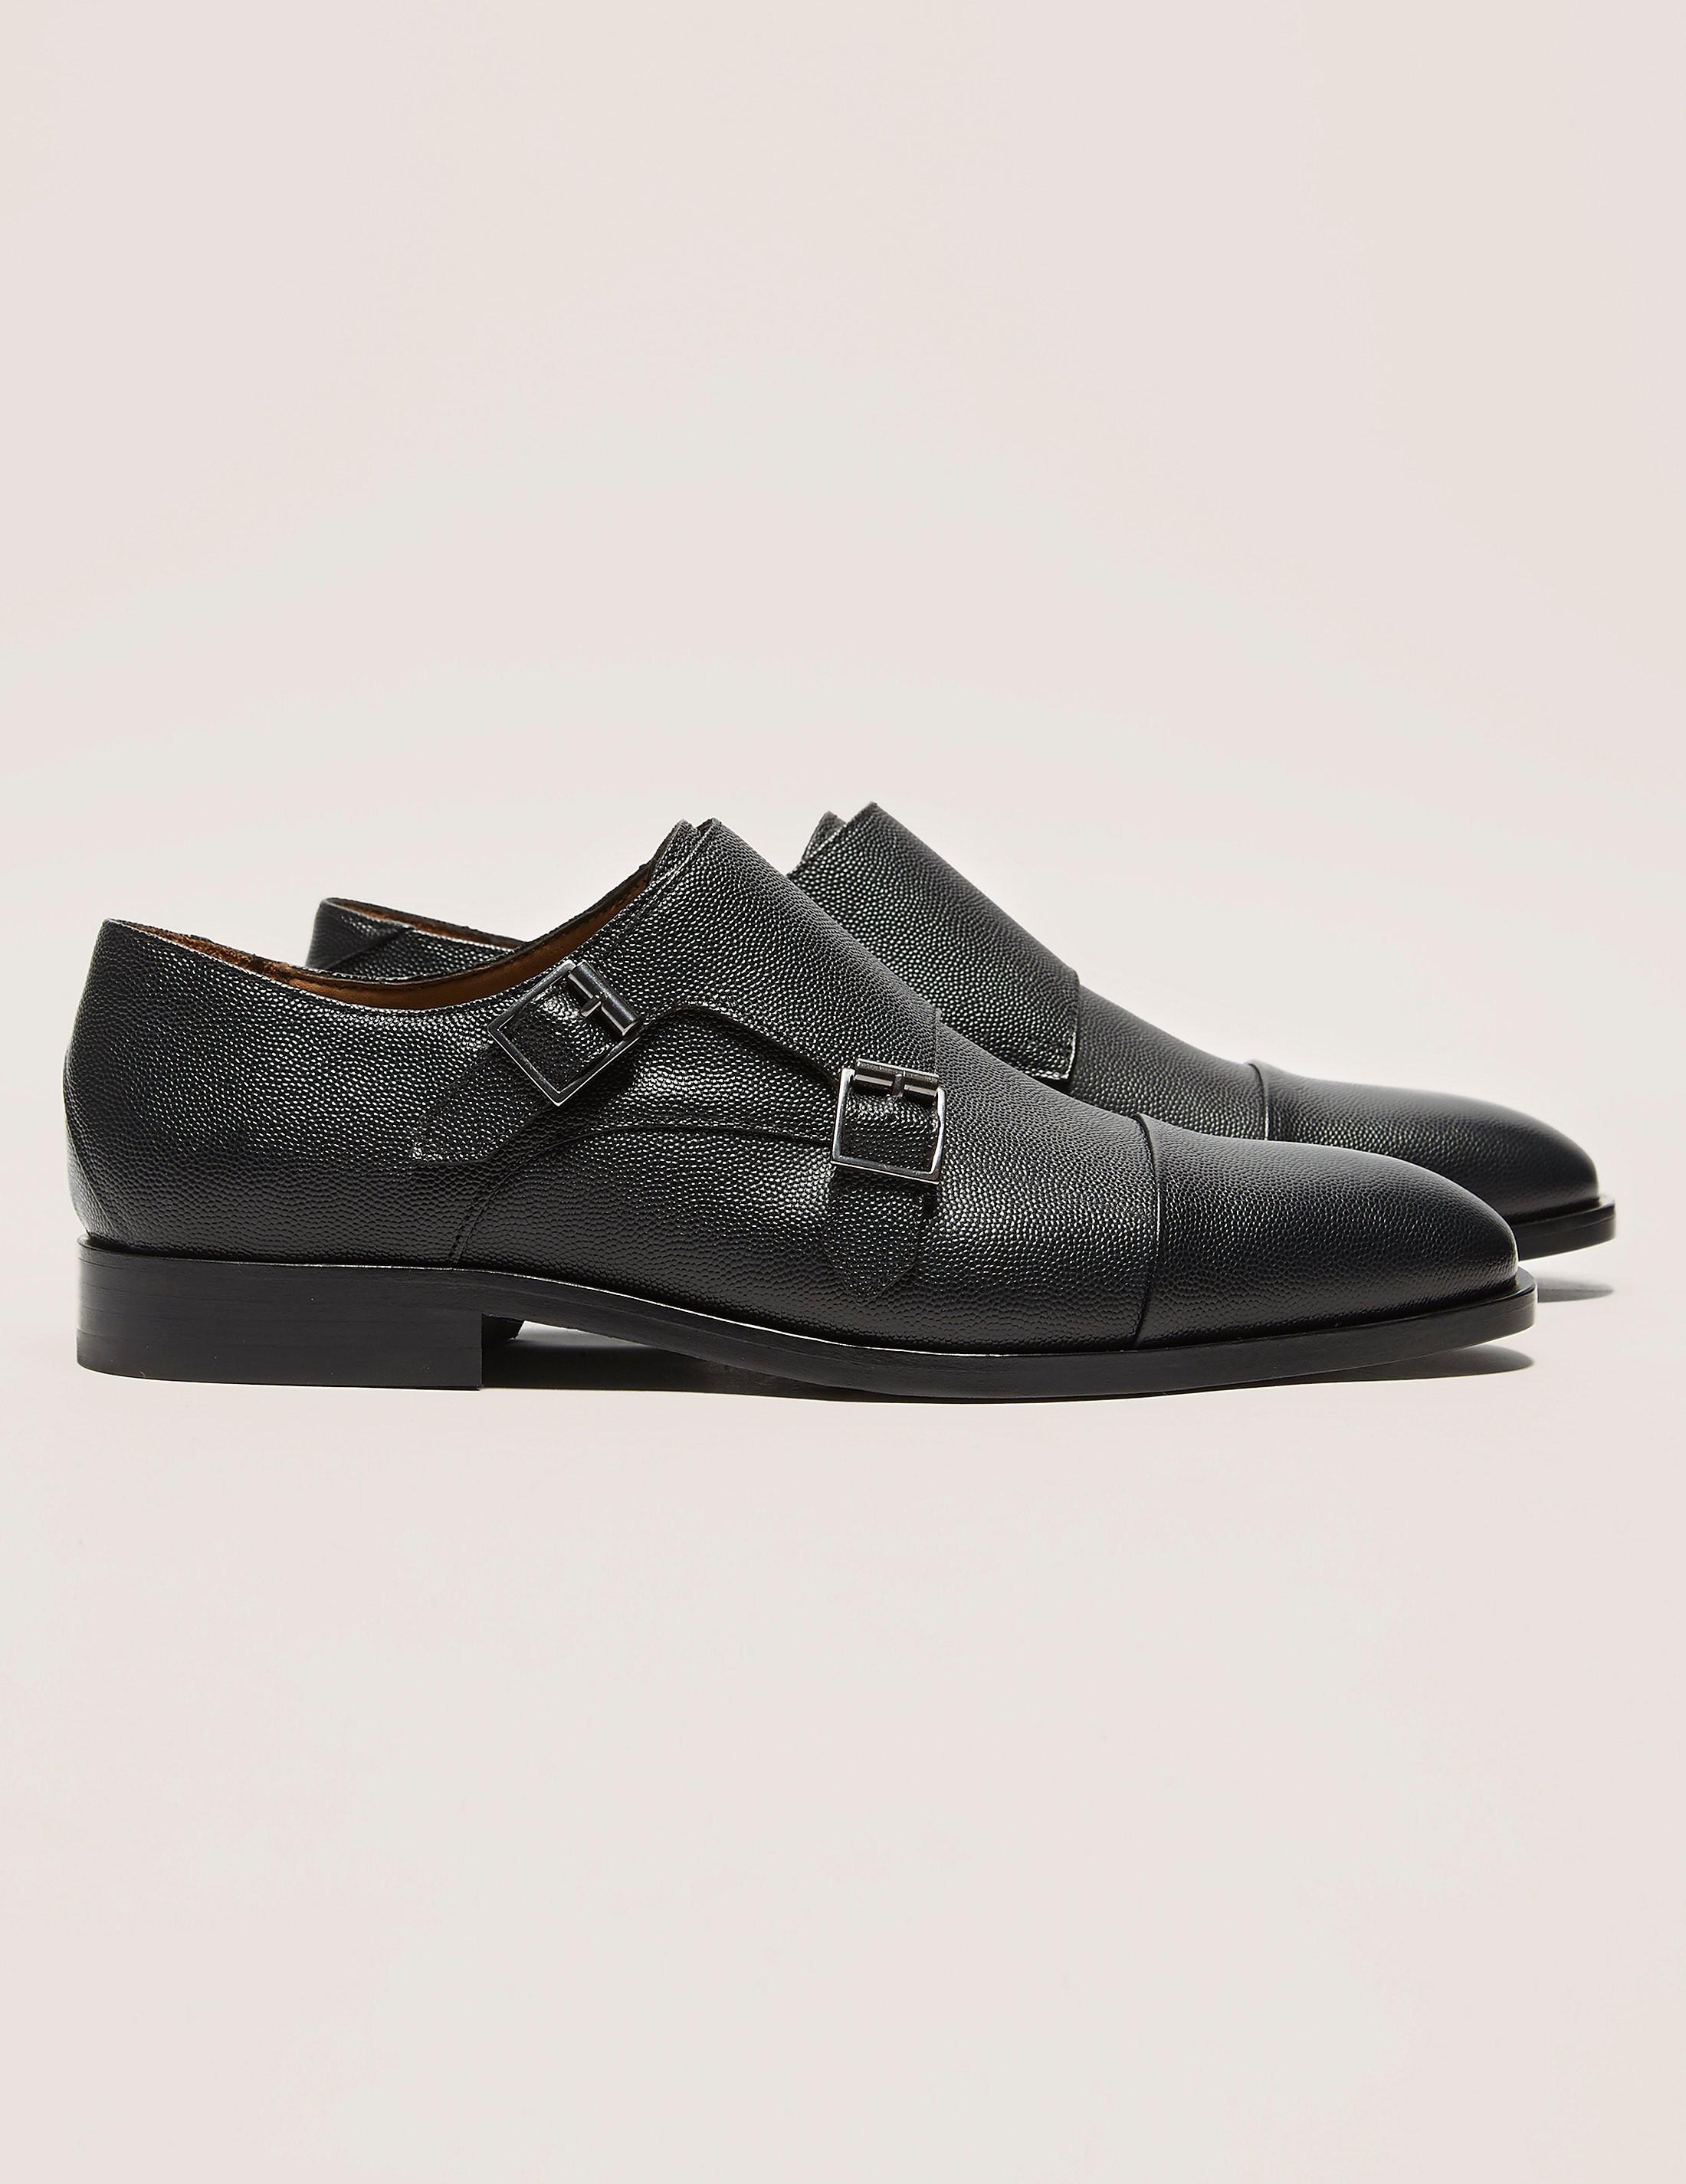 Paul Smith Luigi Shoes